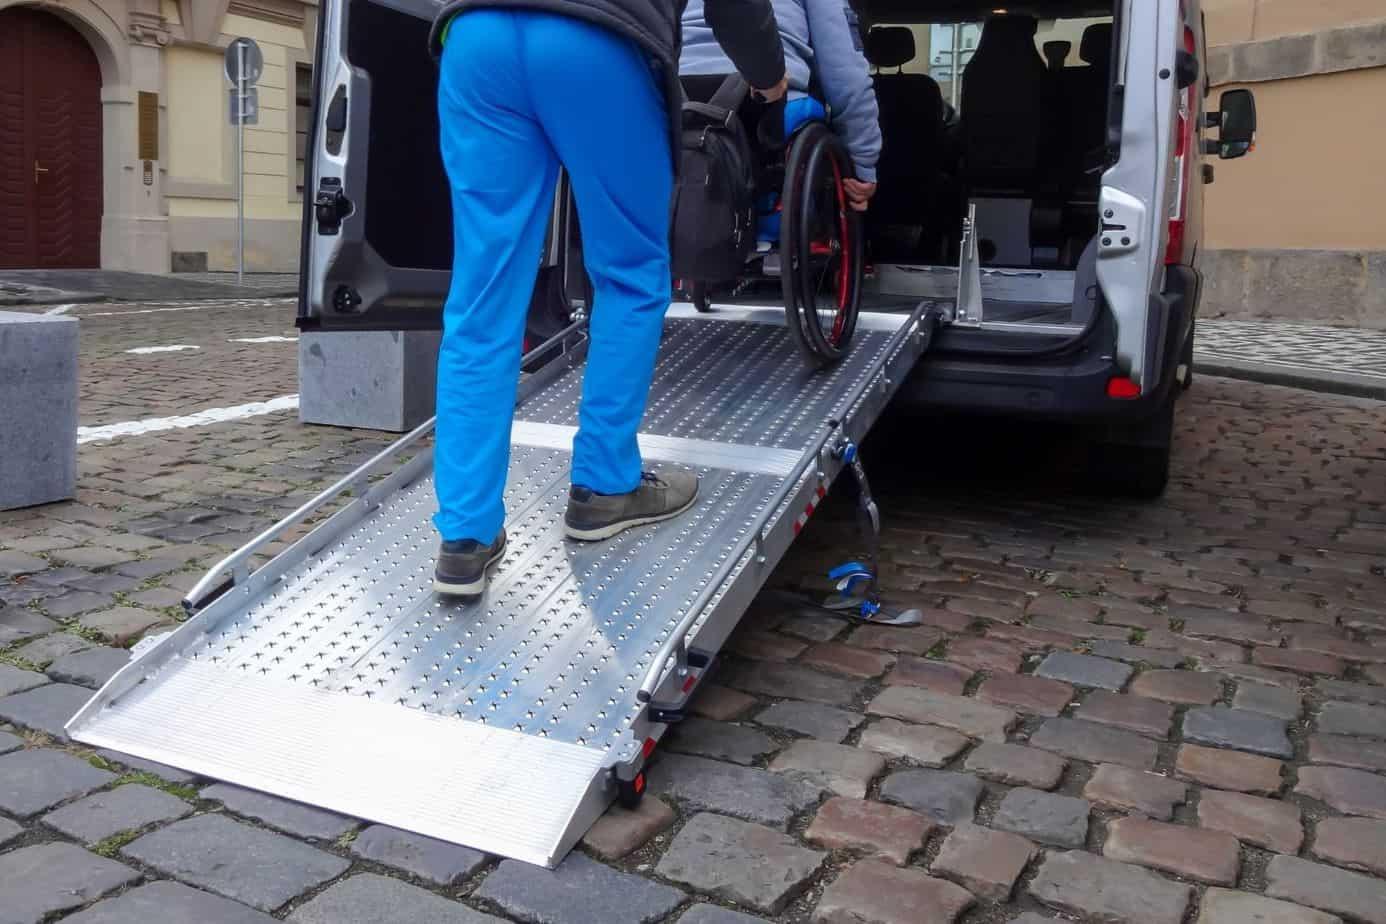 pushing wheelchair inside the van